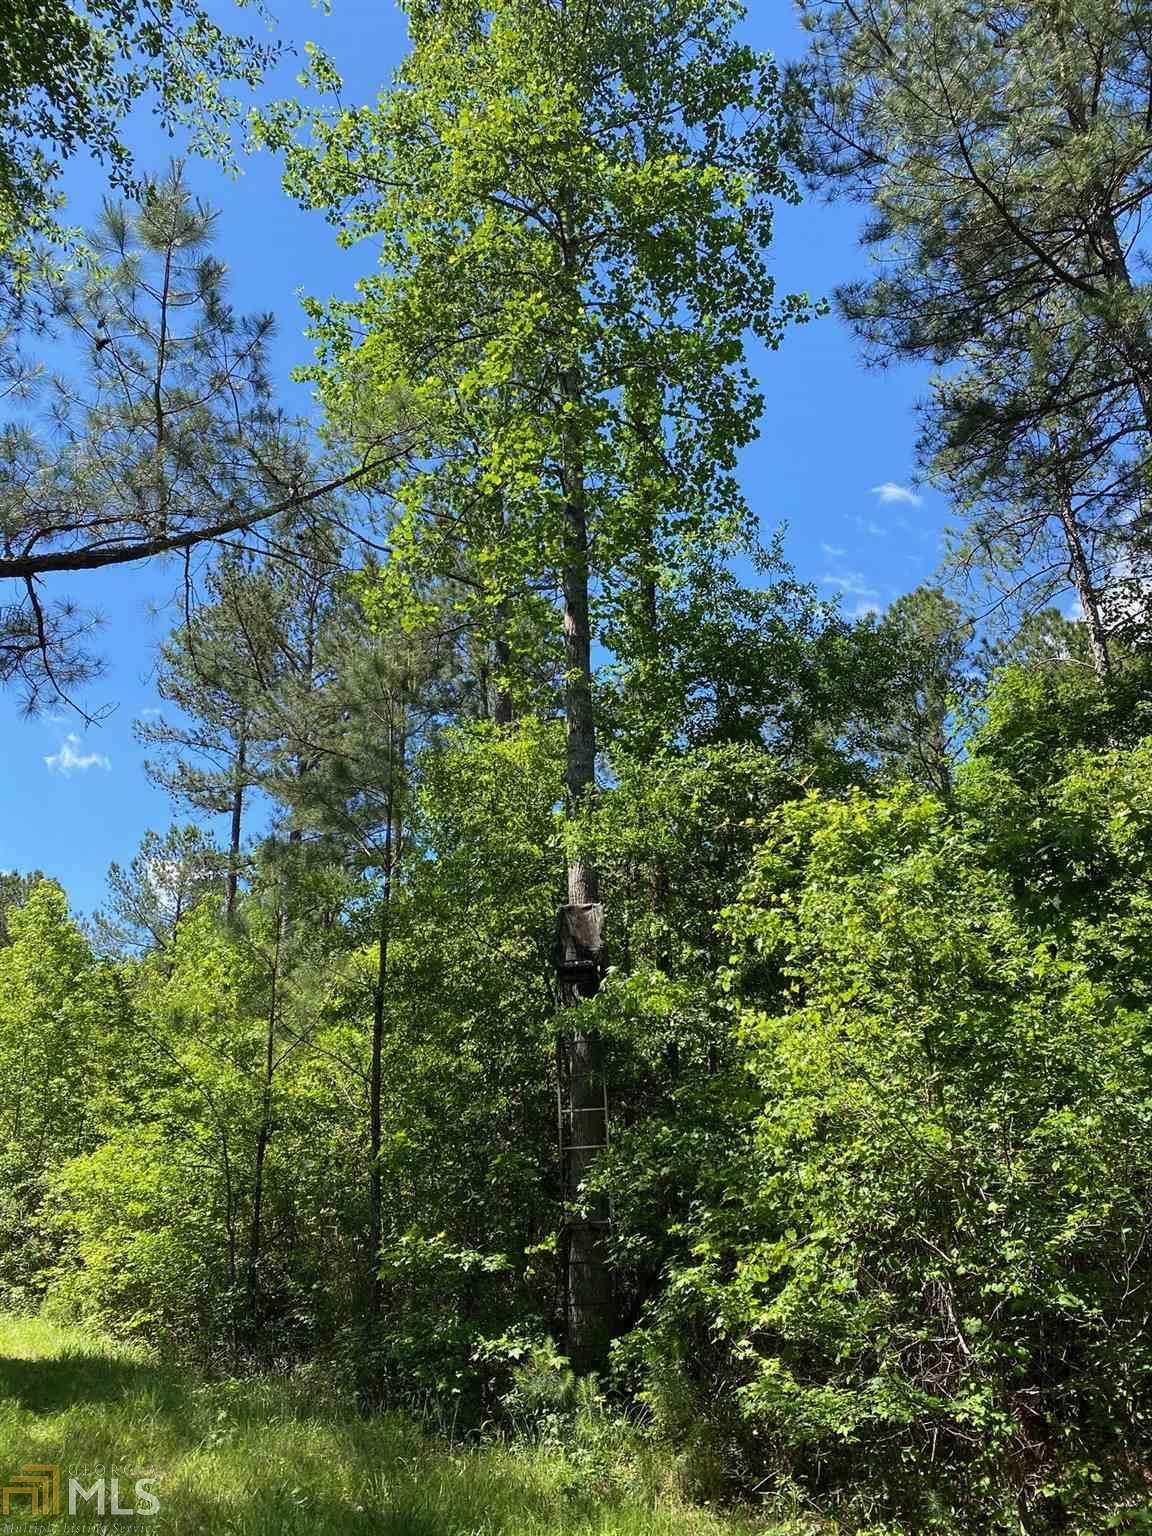 2226 Georgia Highway 19 - Photo 1